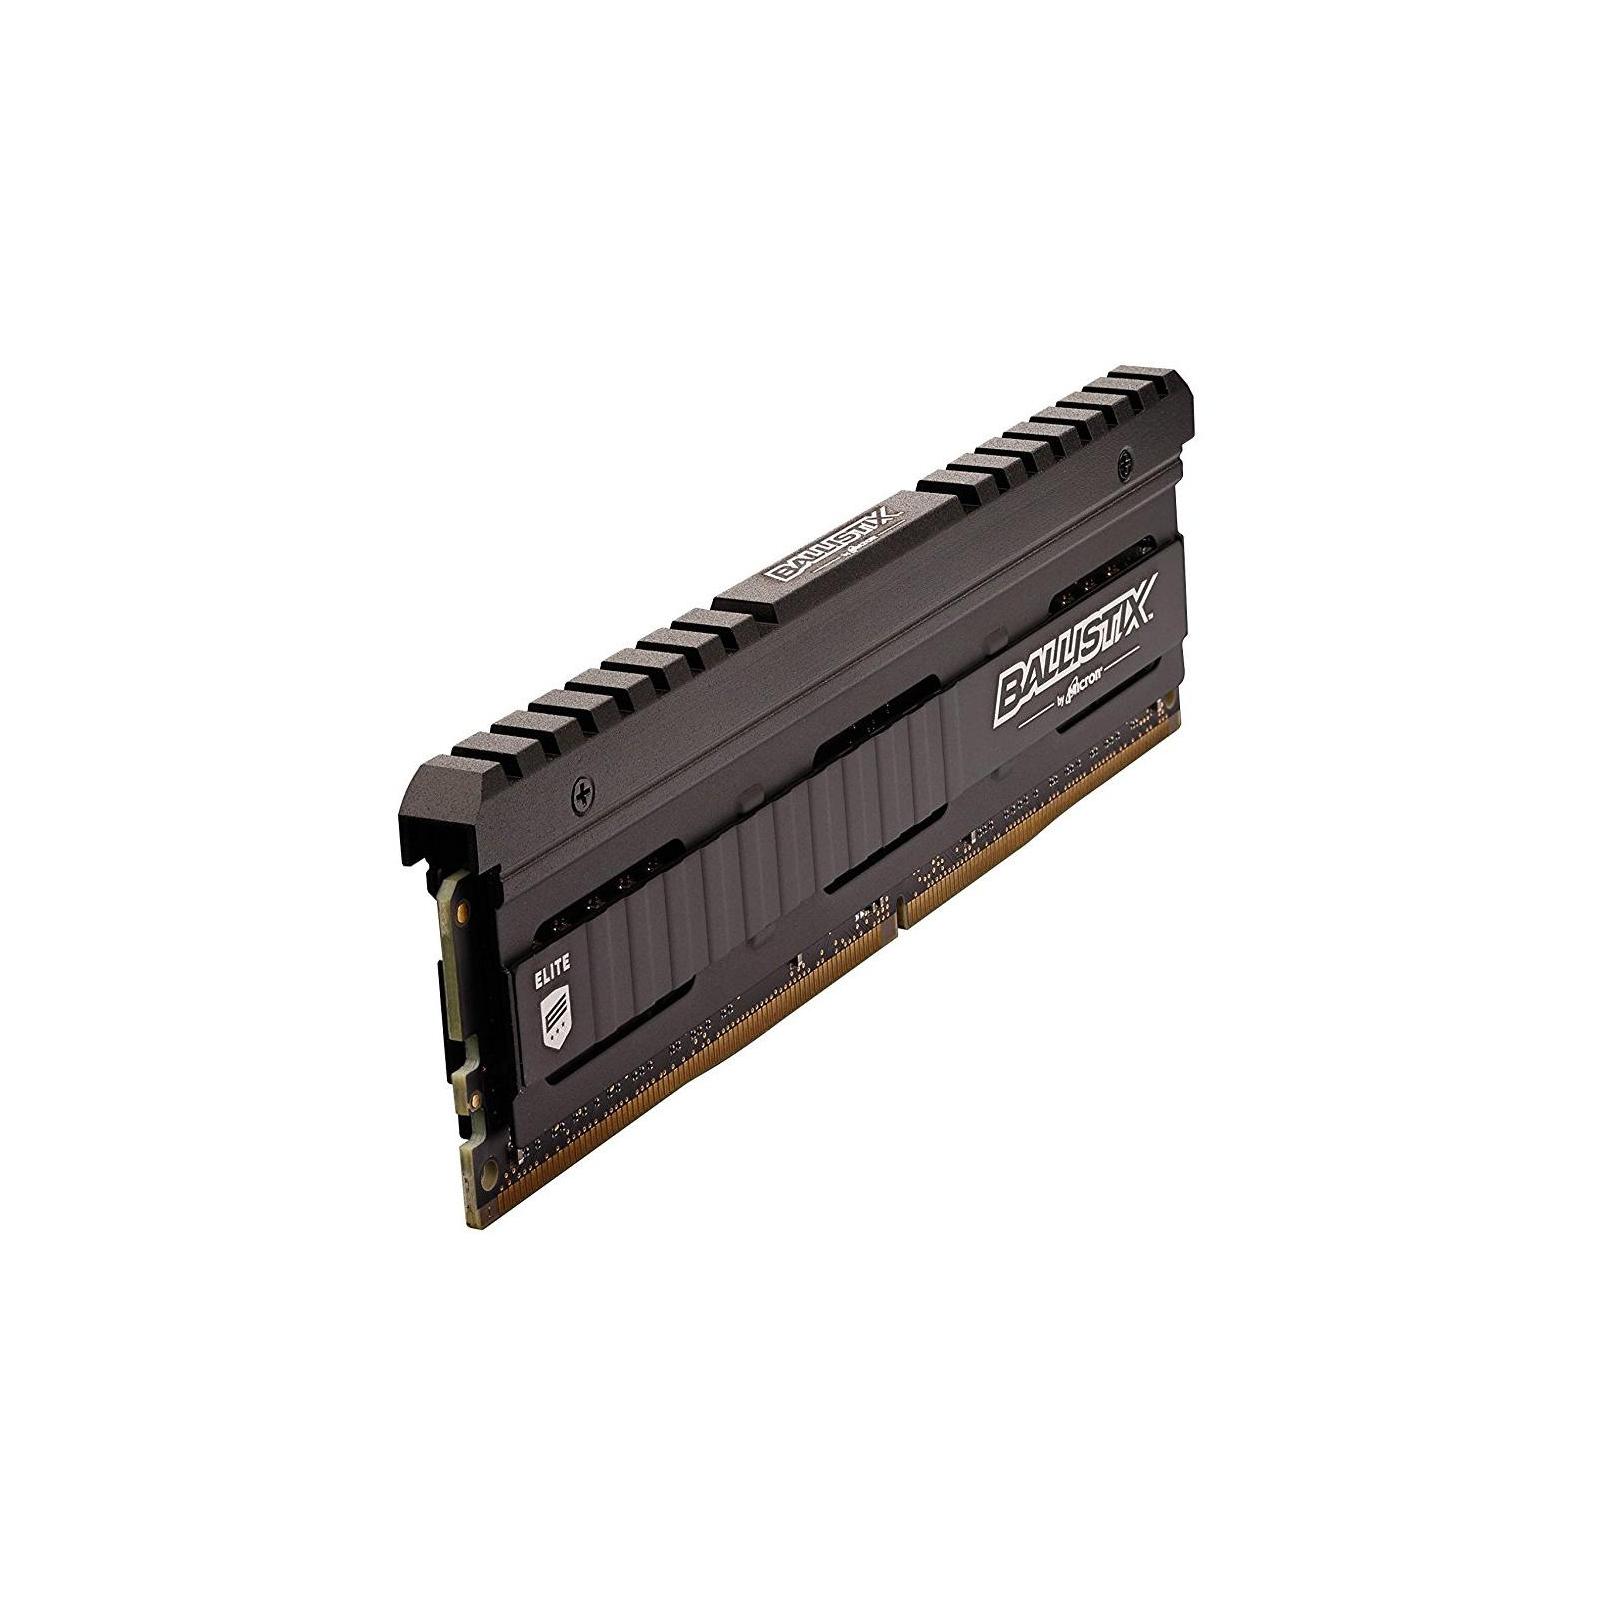 Модуль памяти для компьютера DDR4 16GB (2x8GB) 3200 MHz Ballistix Elite Micron (BLE2C8G4D32BEEAK) изображение 2